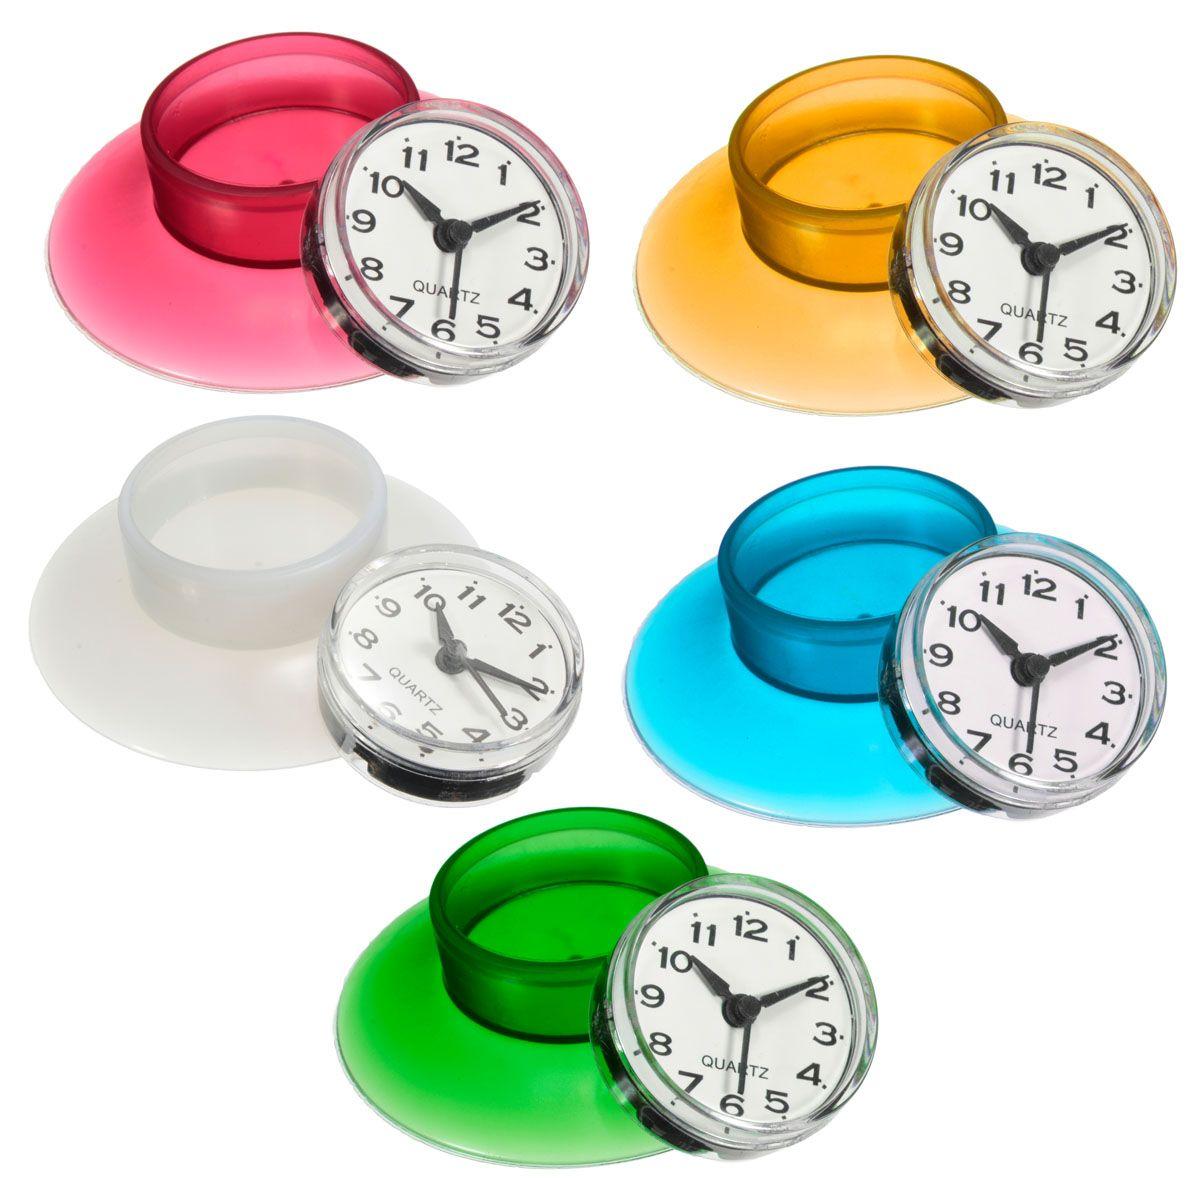 Honana Bx 103 Bathroom Waterproof Wall Clock Resistant Timer Suction Cup Wanduhren Silikon Farben Und Uhren